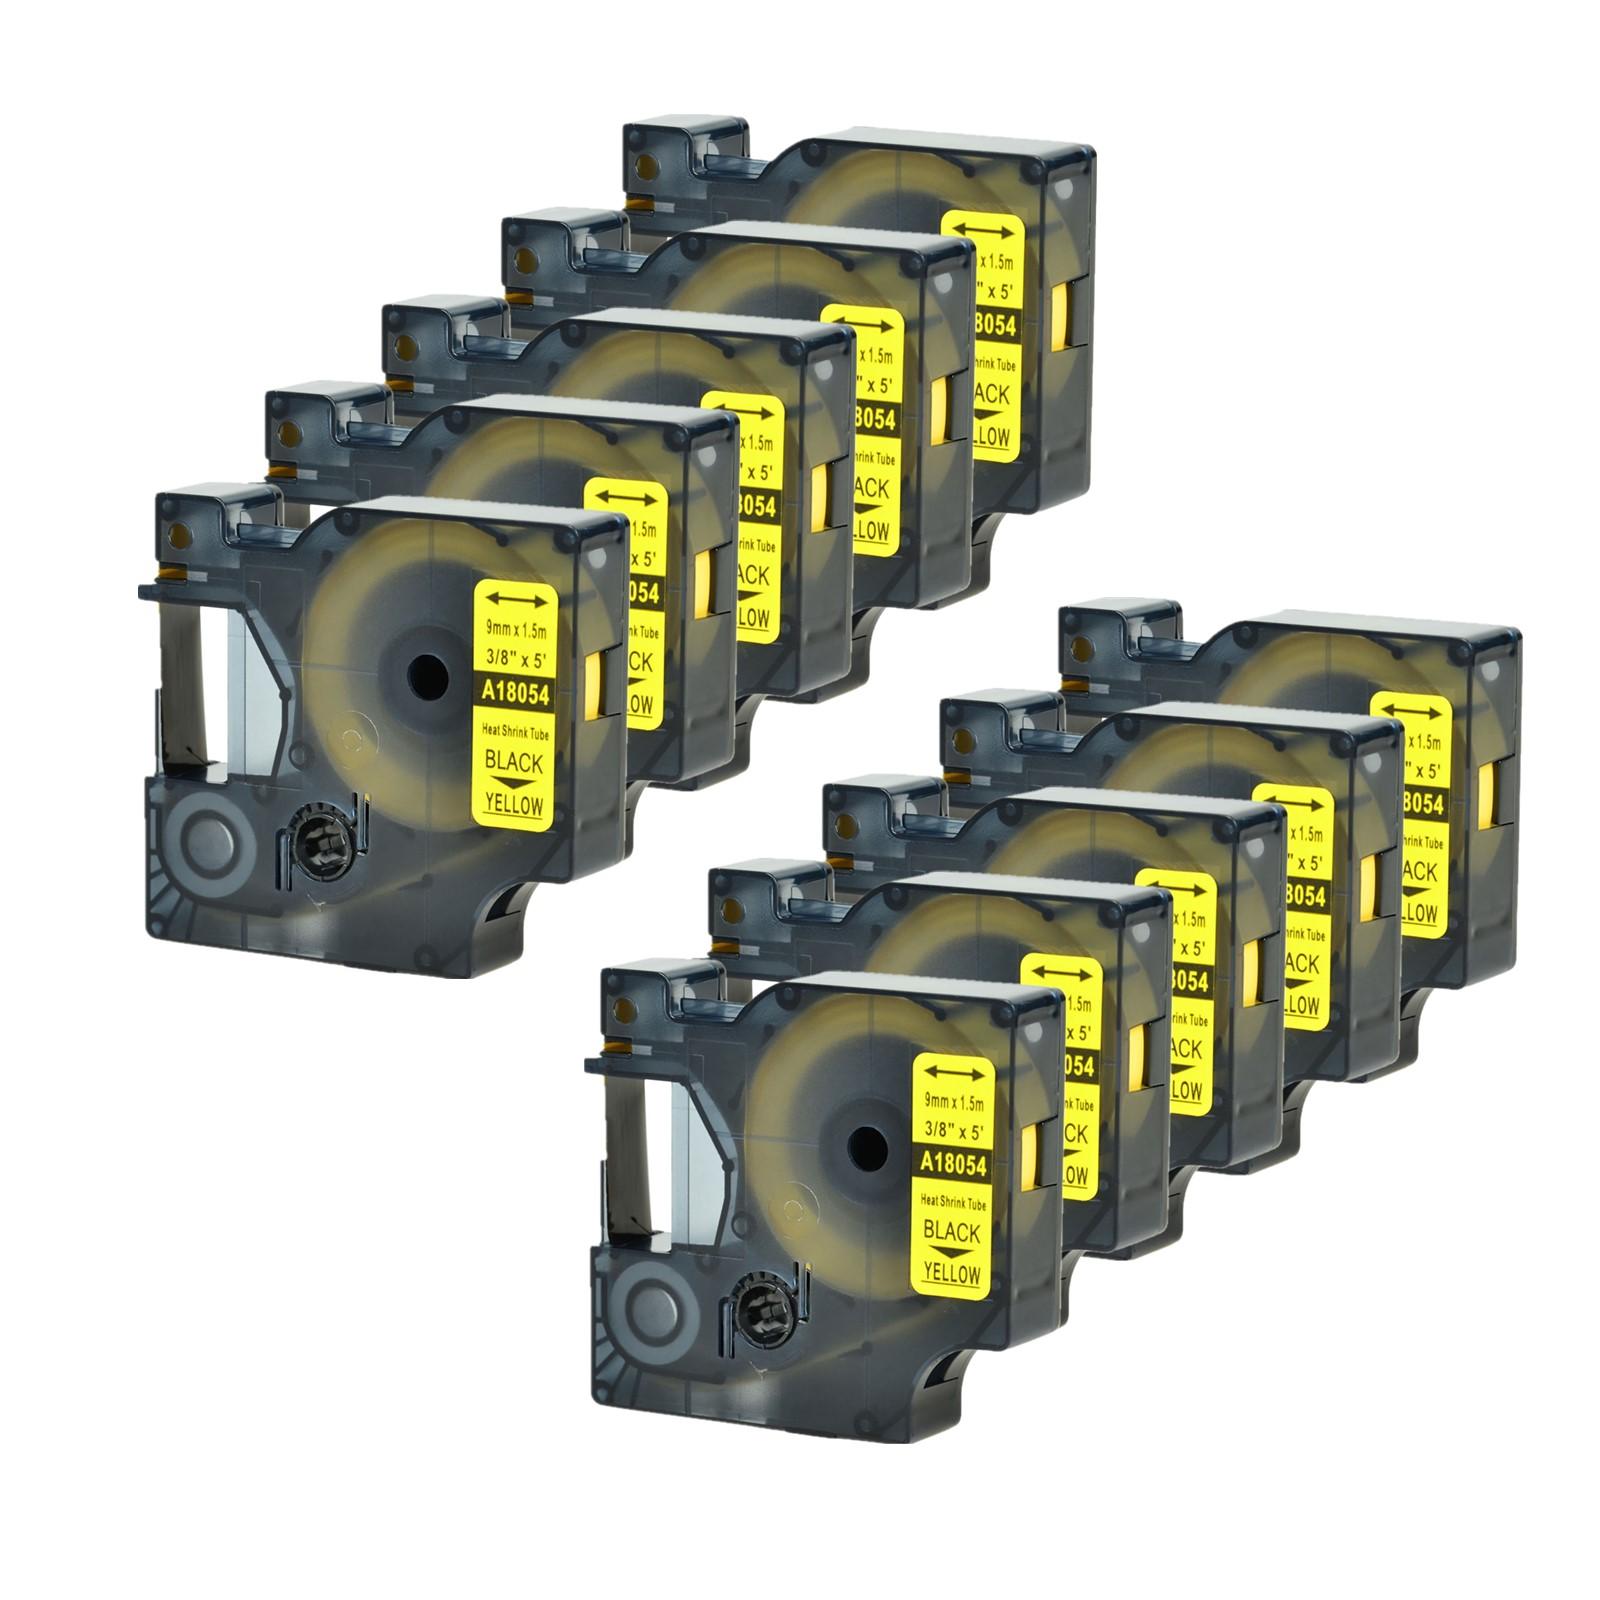 10* For DYMO Rhino 5000//6000 Heat-Shrink Tube 18054 Industry Label Tape 9mm*1.5m